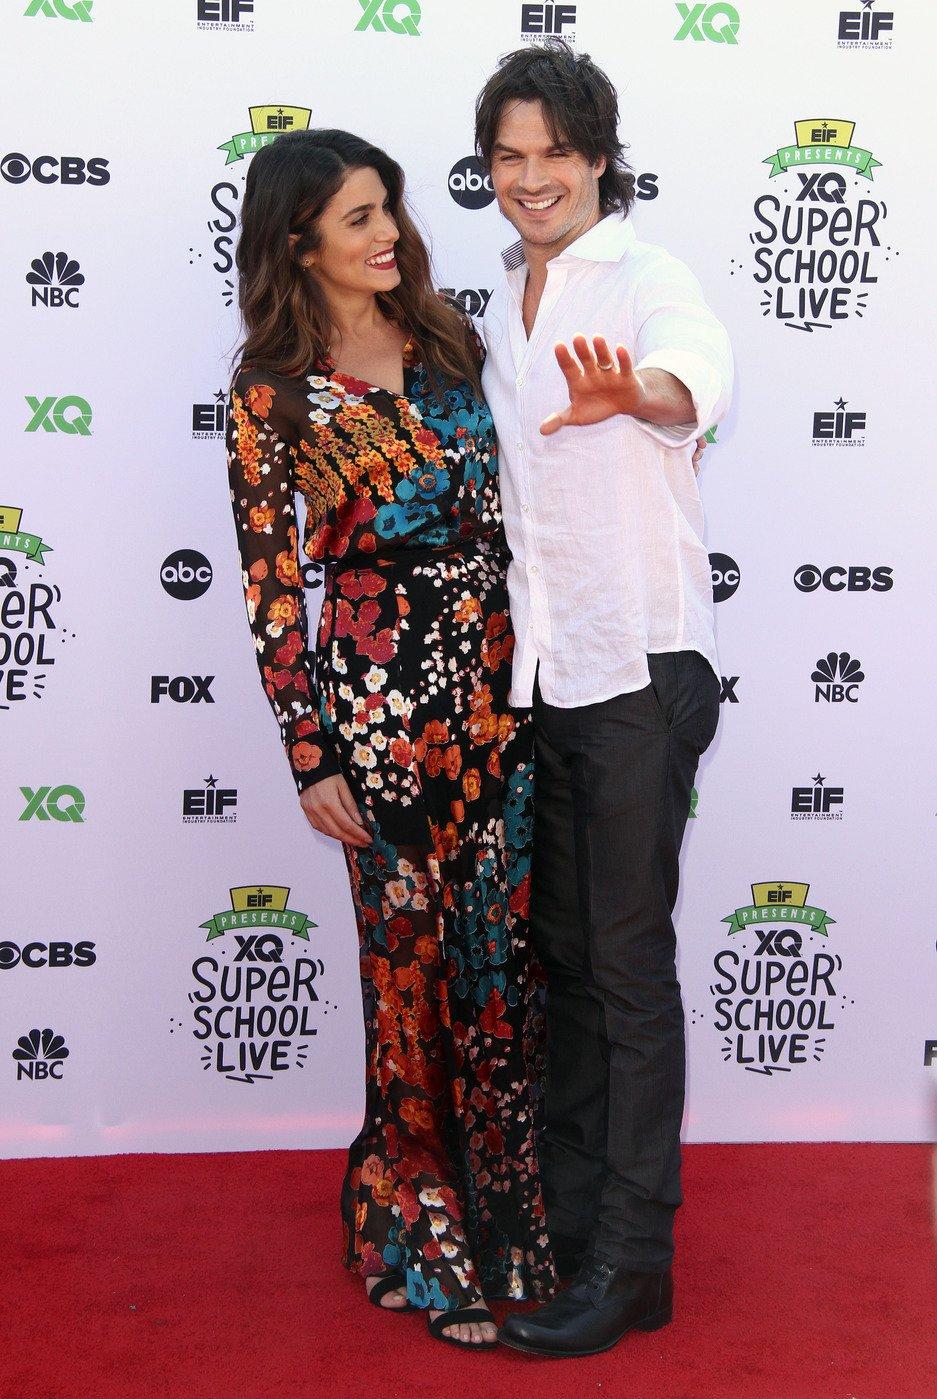 Nikki Reed and Ian Somerhalder attend Super School Live in Los Angeles on Sept. 8, 2017